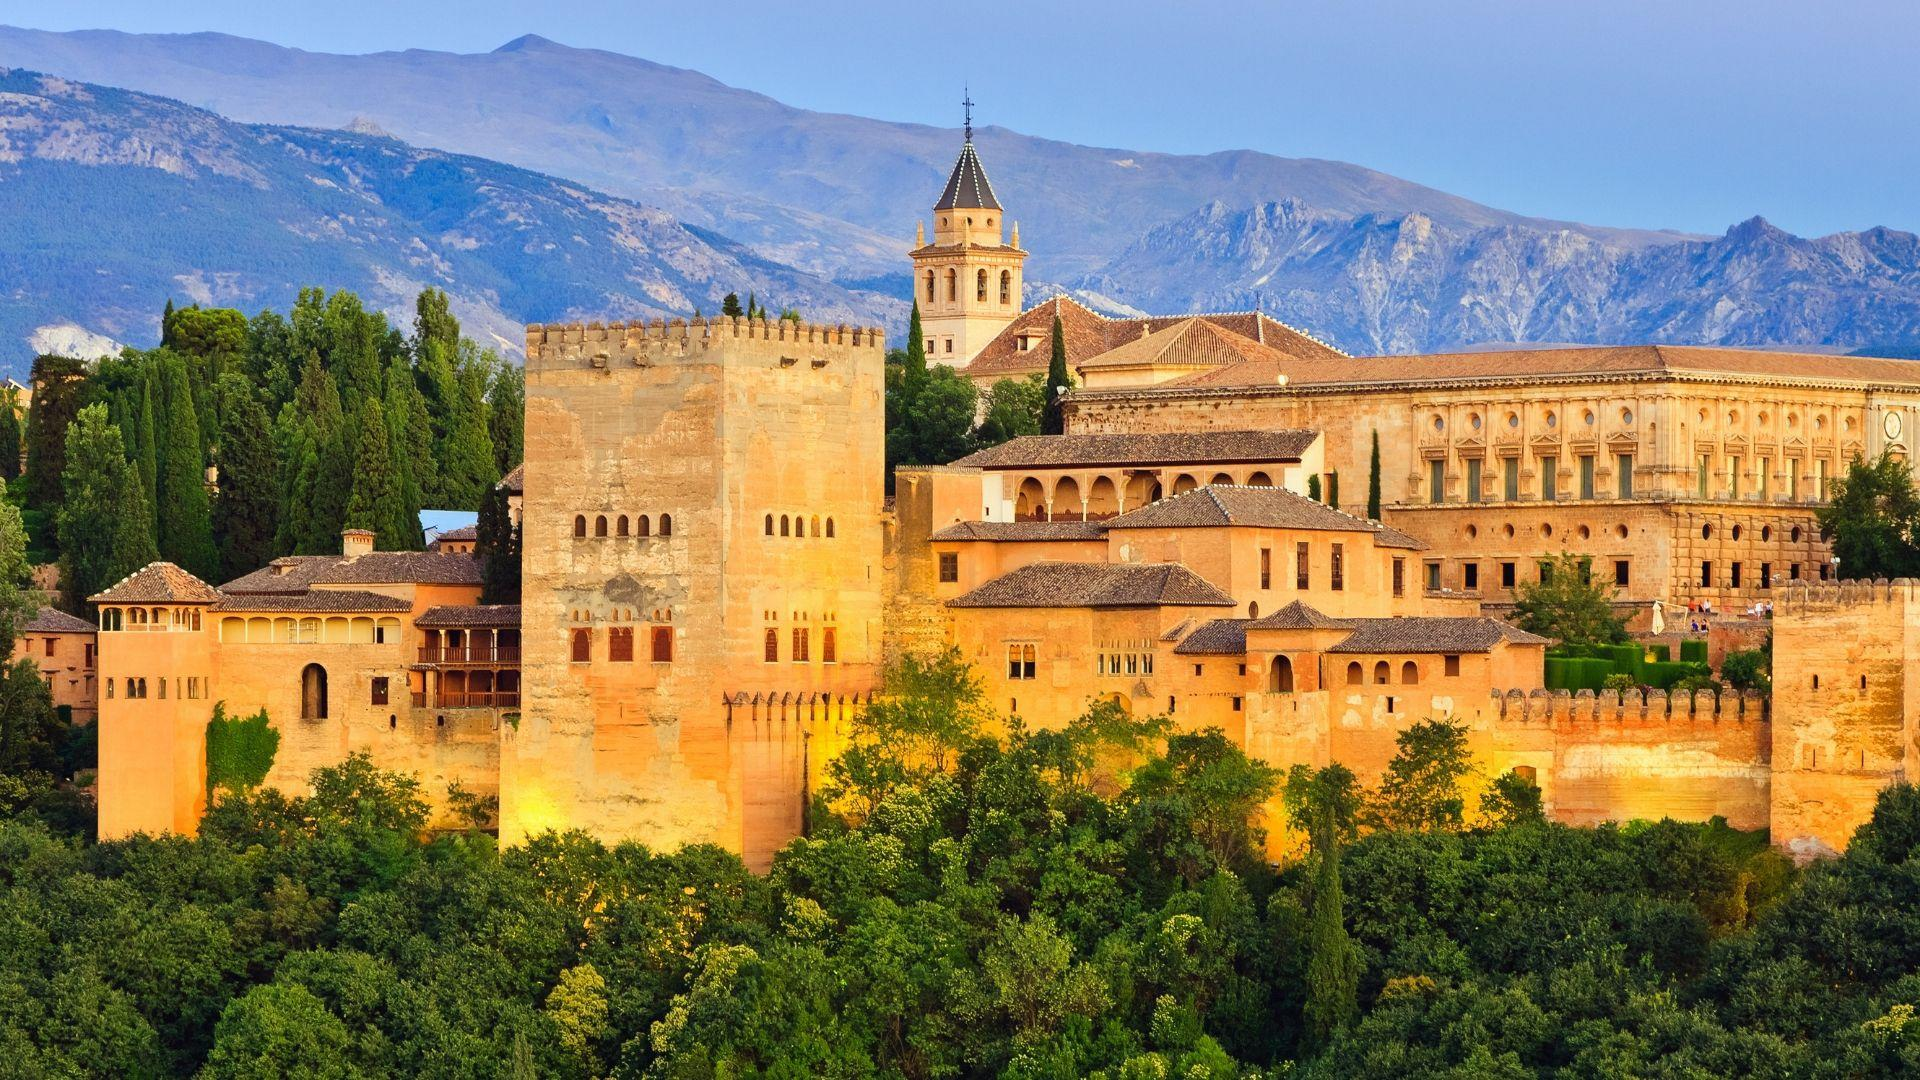 Įspūdingi Alhambros rūmai